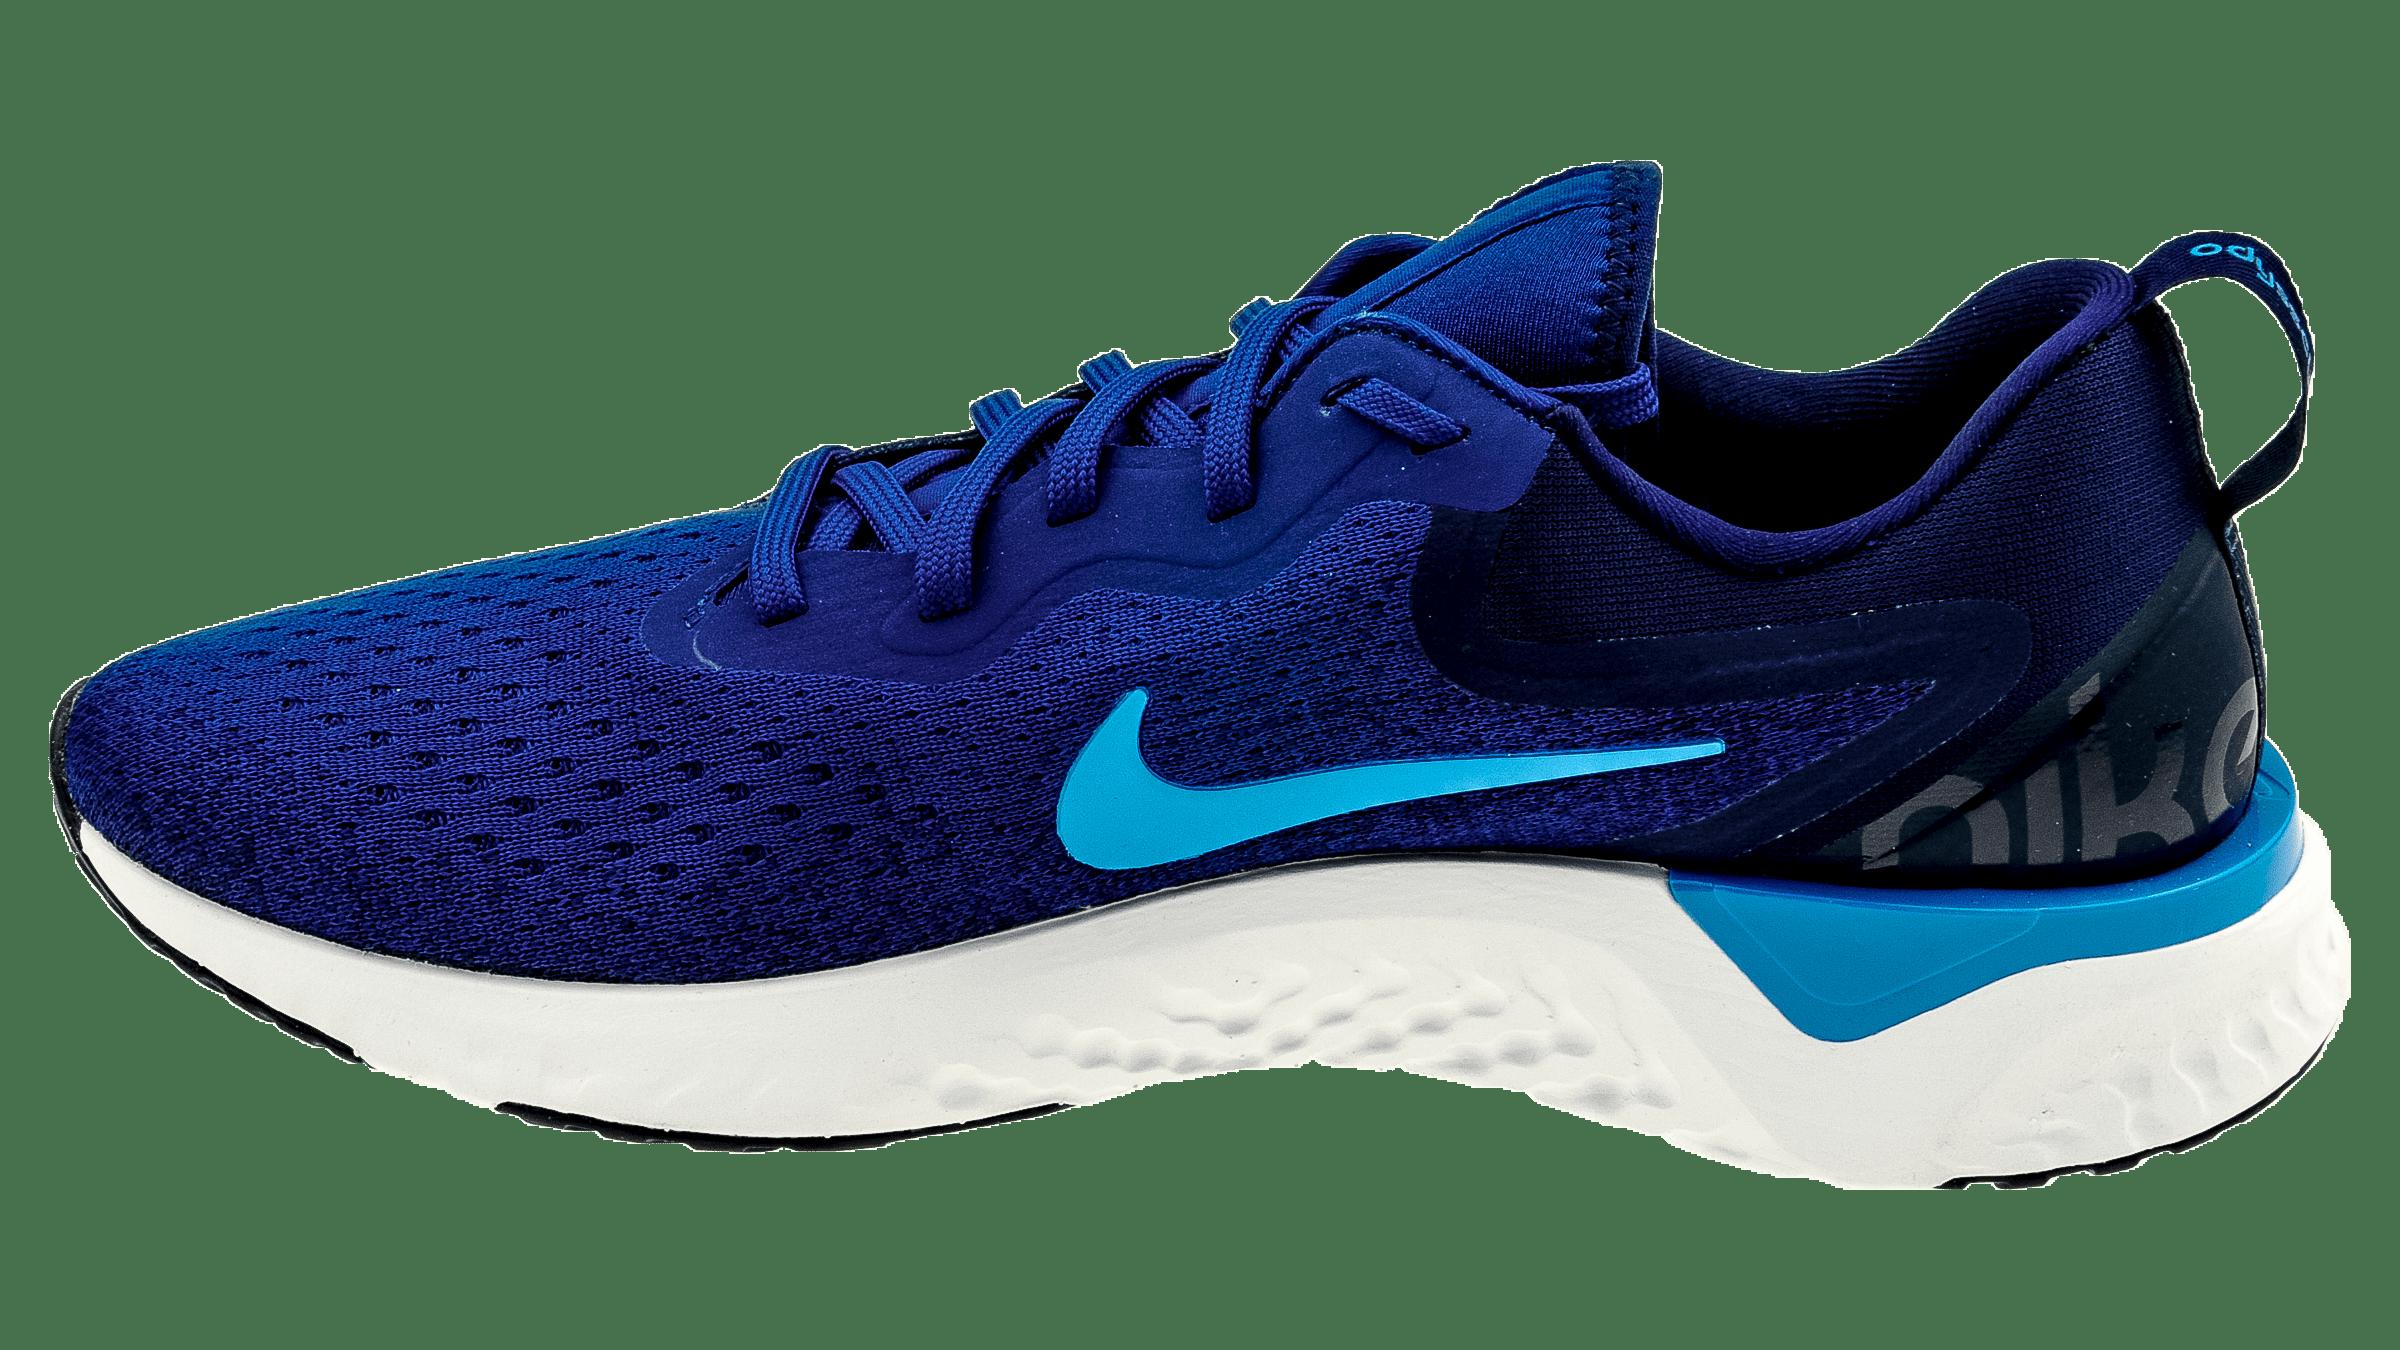 bestellen dump blueblue hero nl Skate Odyssey Nike gym React bij 7wXqHqZn